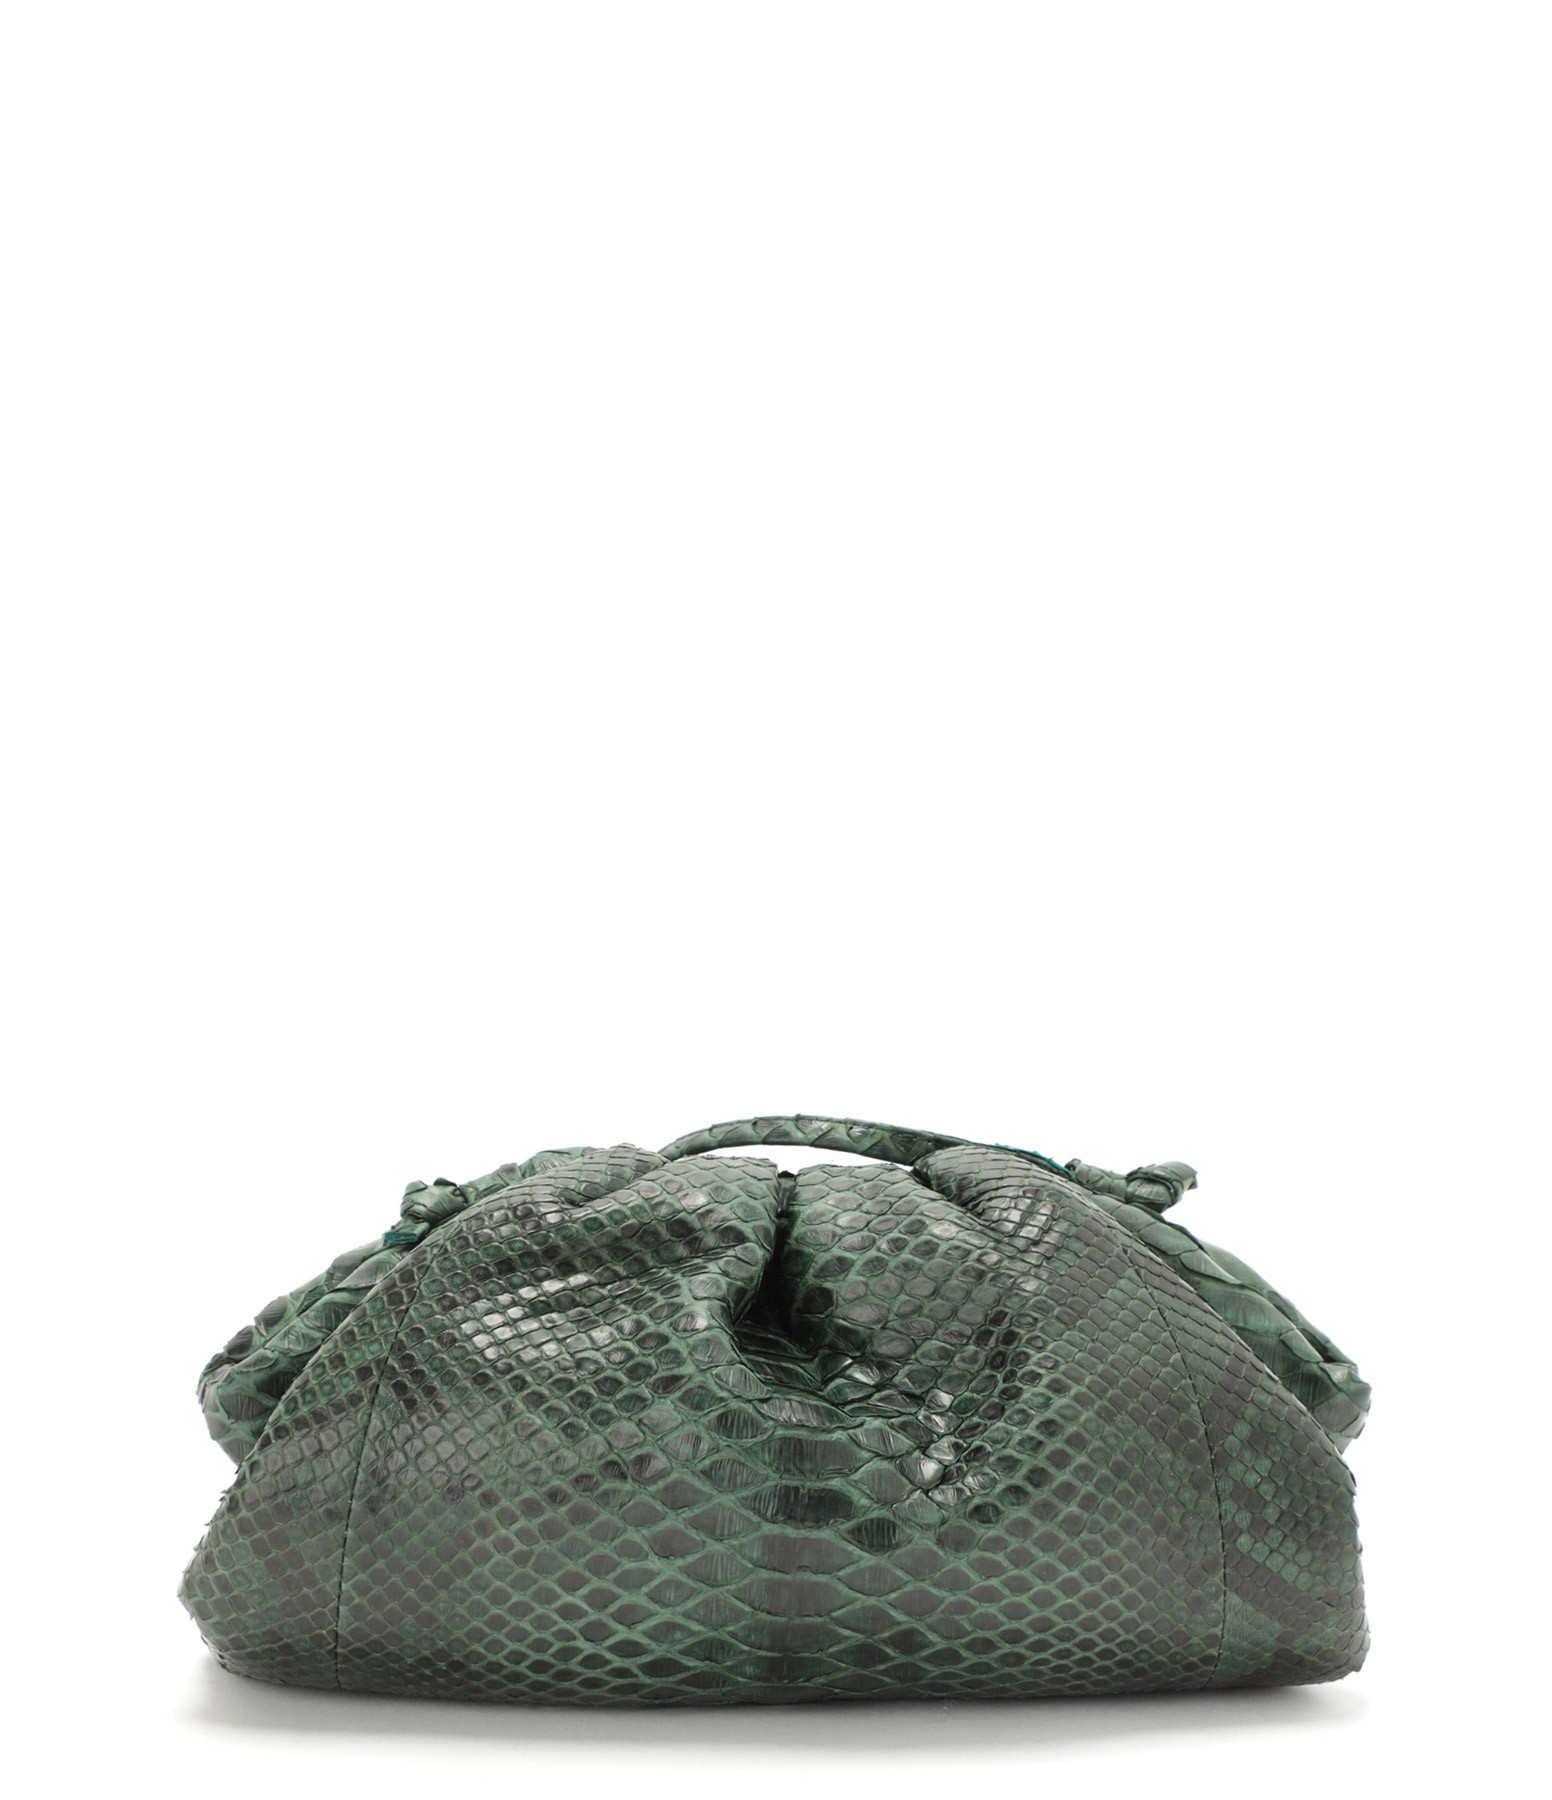 SISTA - Sac Baby Cuir Souple Python Vert